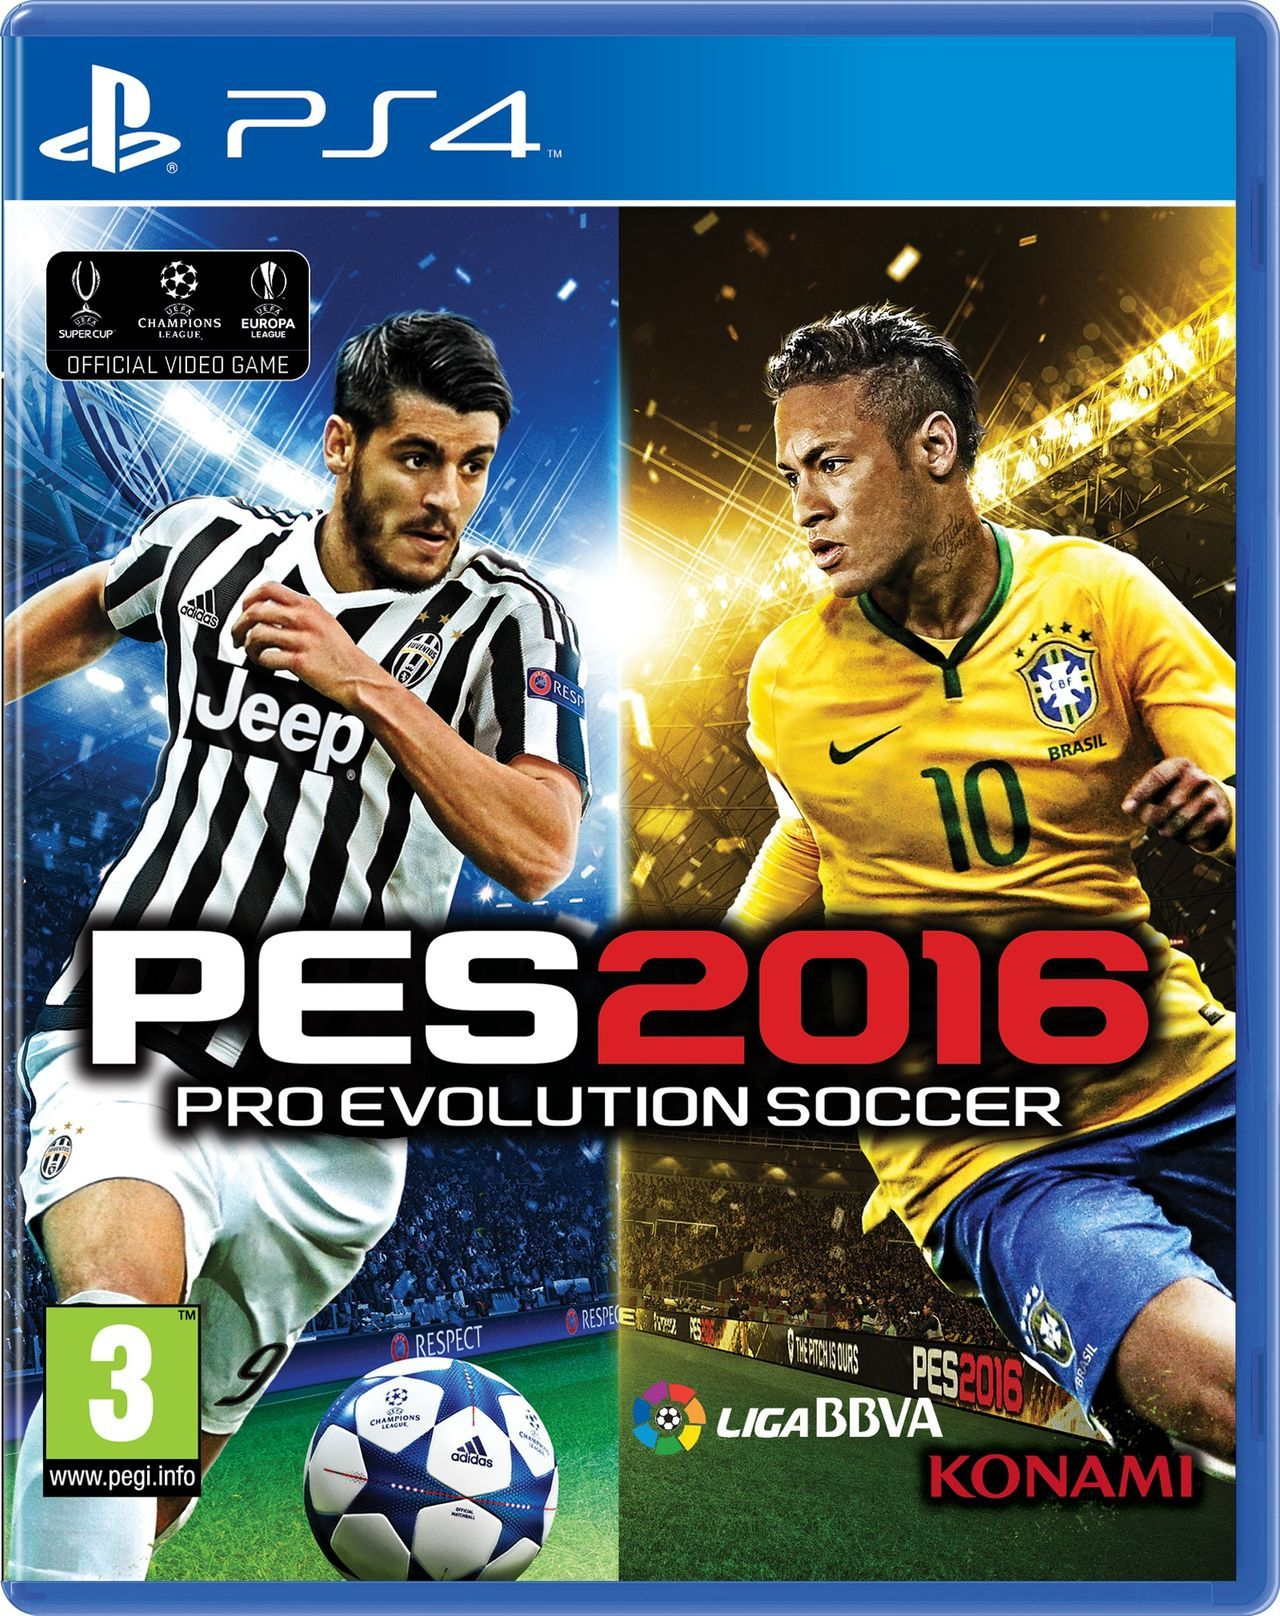 Pro Evolution Soccer 2016 Toda La Informacion Ps4 Pc Ps3 Xbox